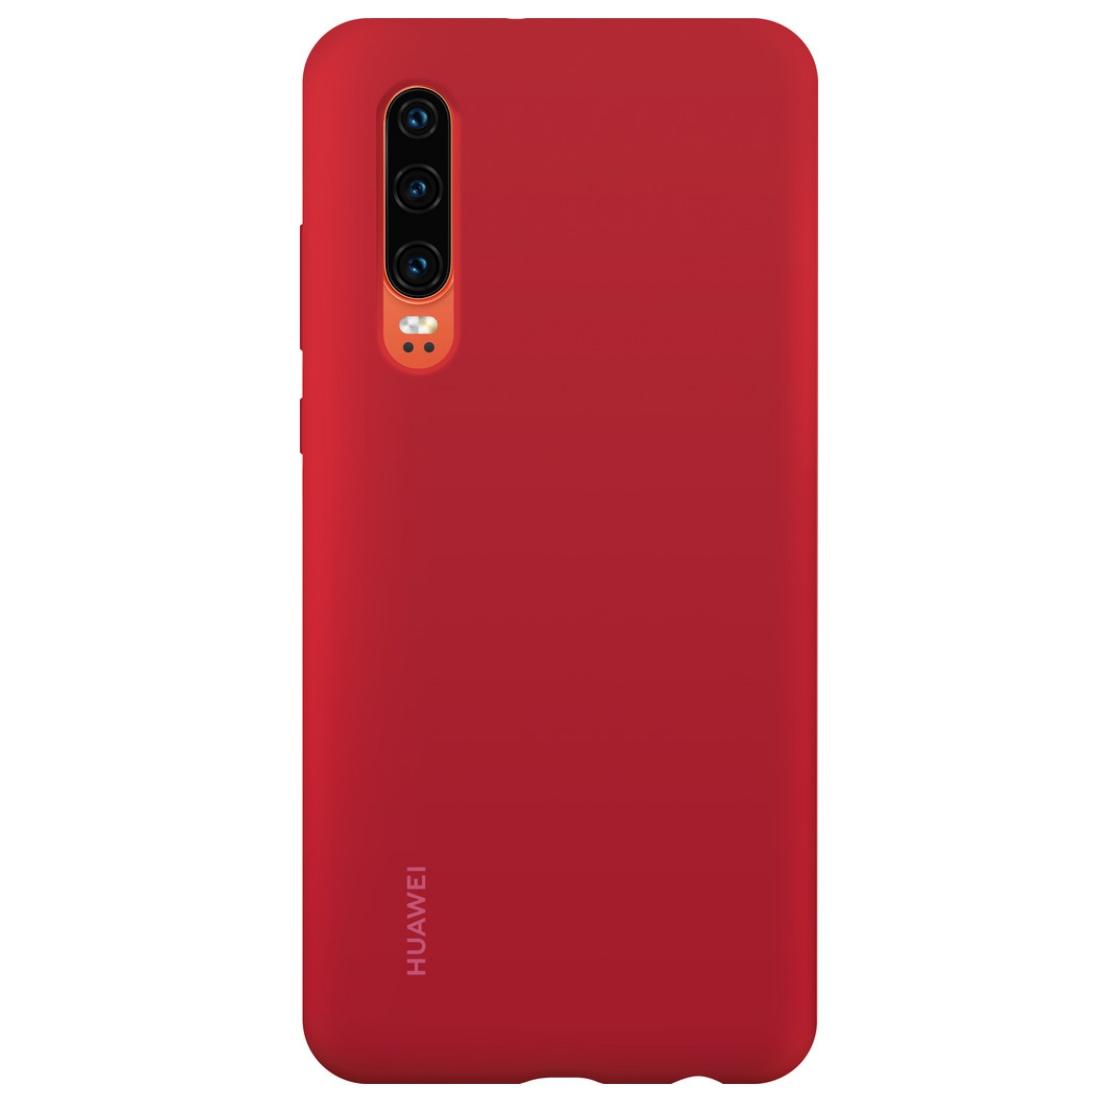 Capac protectie spate Huawei Silicone Cover pentru Huawei P30 Red